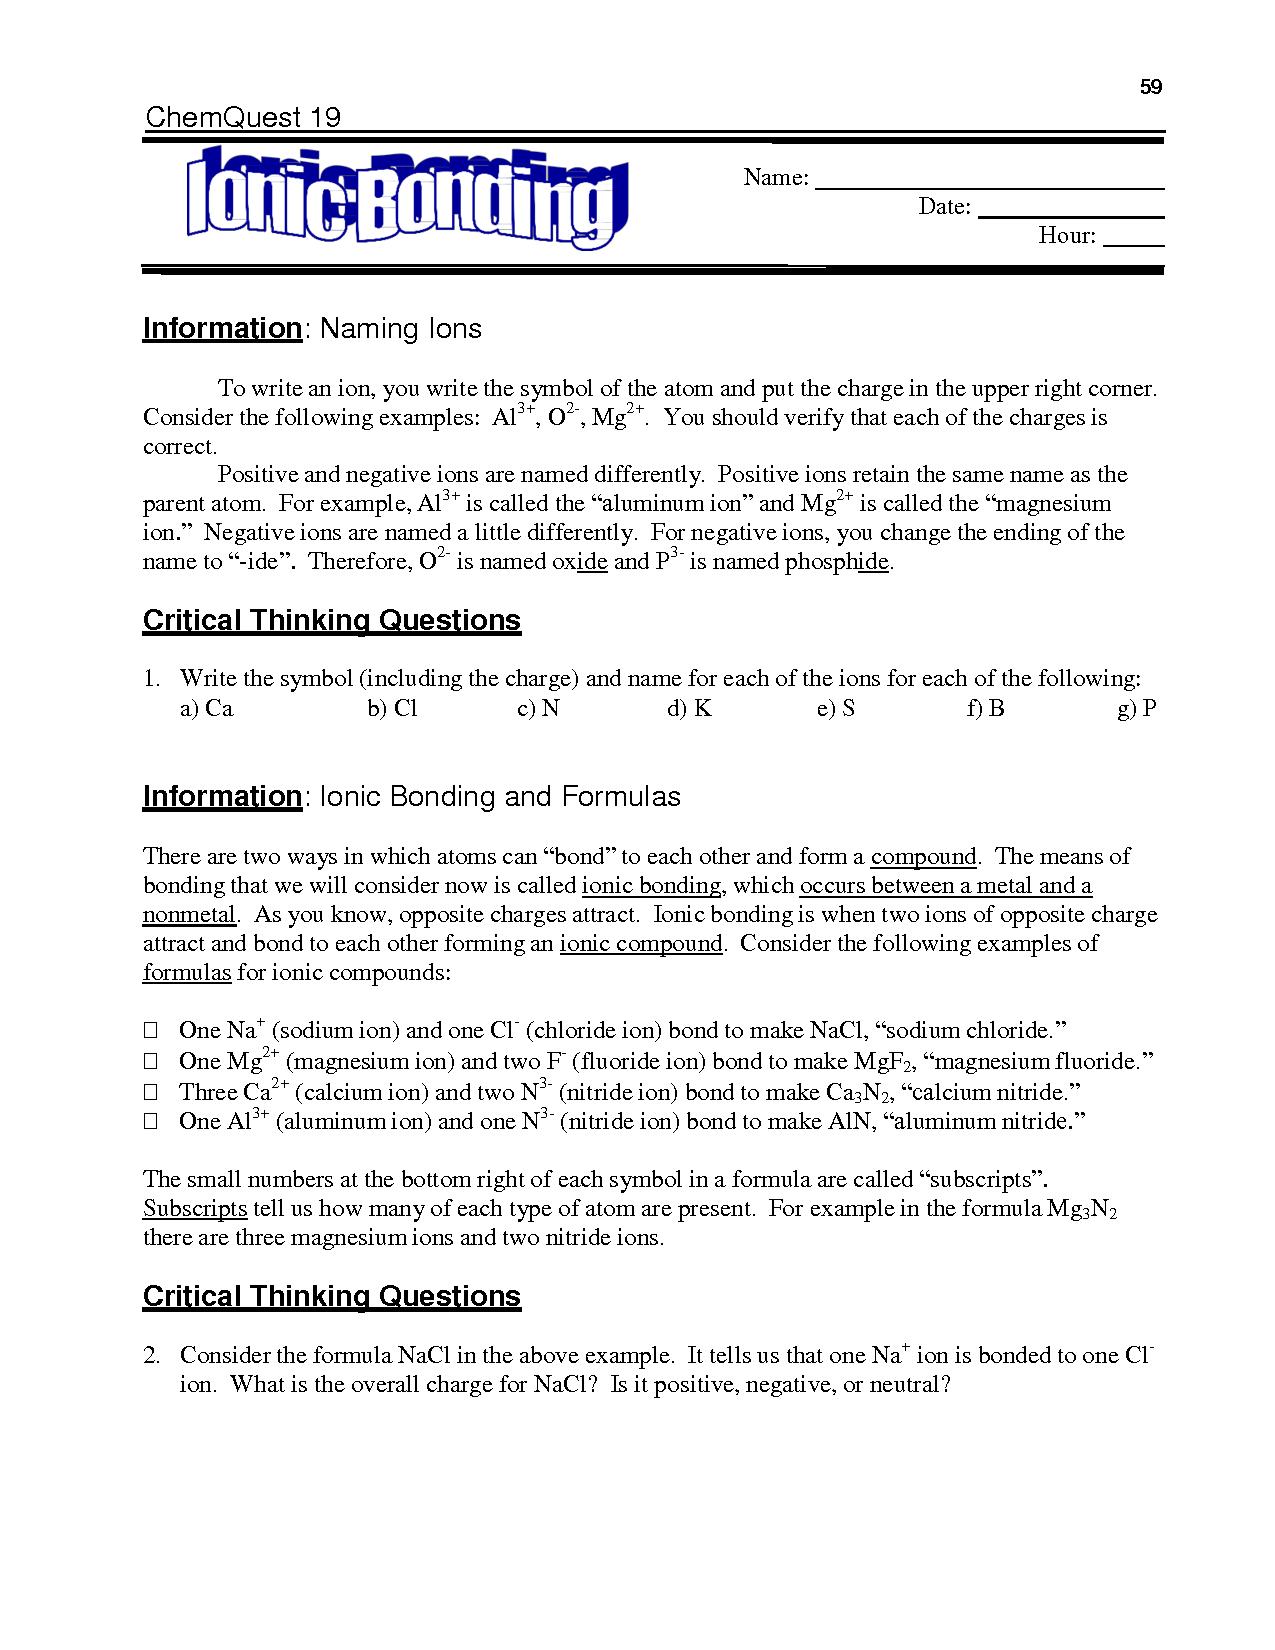 16 Best Images of Ionic Bonding Worksheet Answer Key  Chemistry Chemical Bonding Worksheet